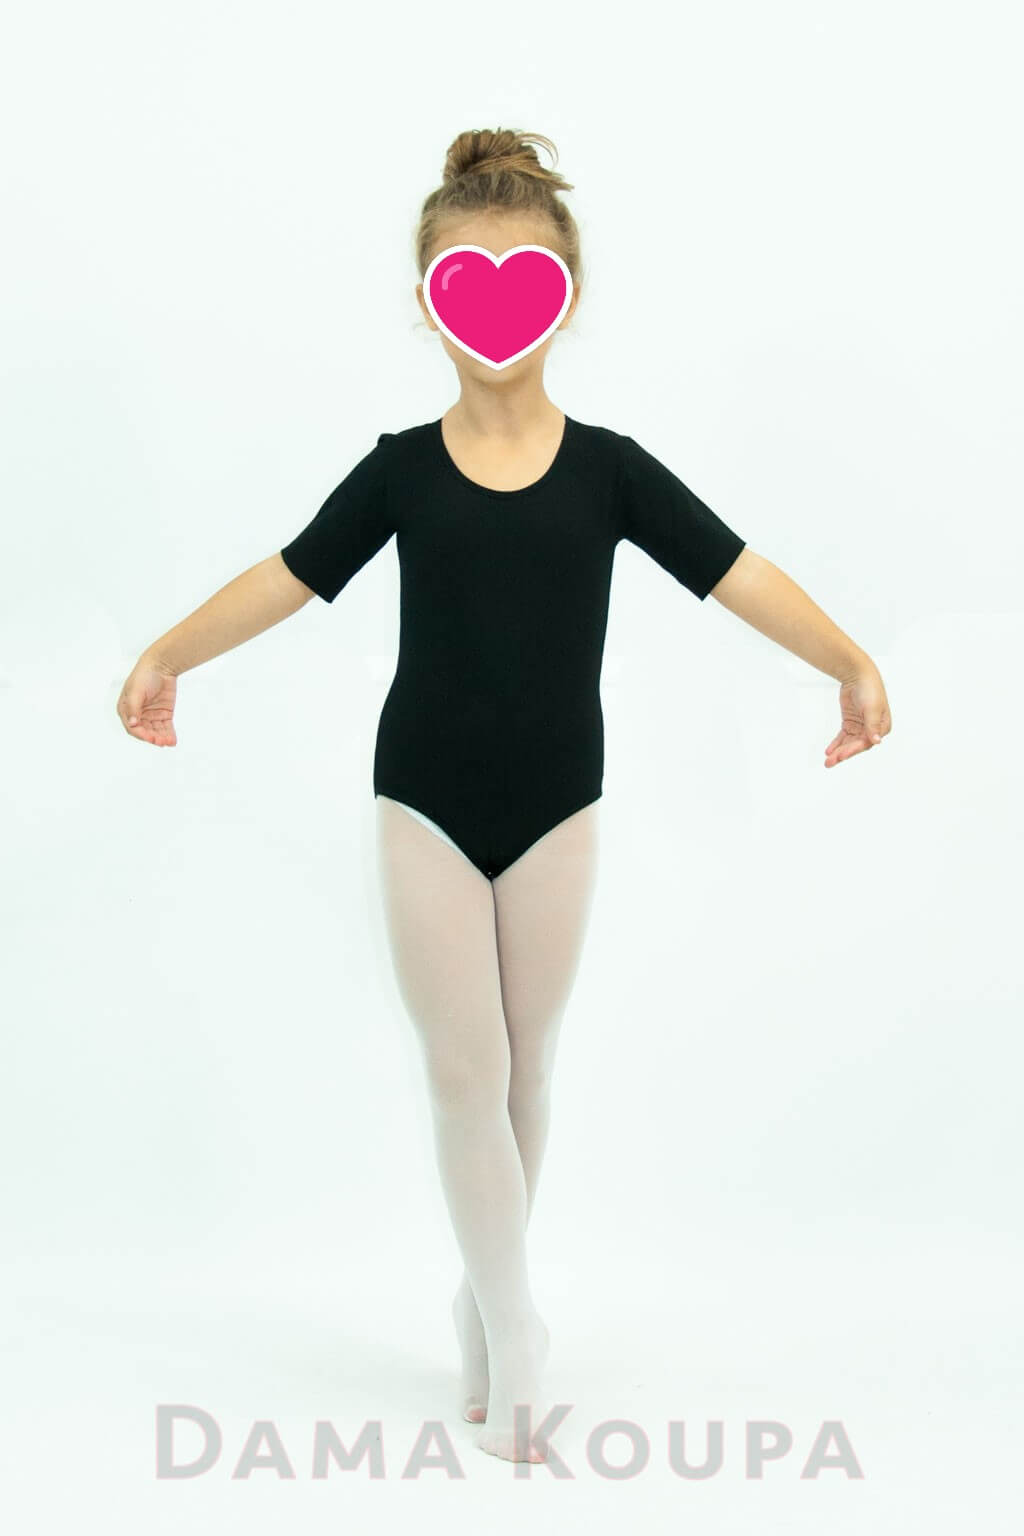 7502c41c0dd Κοντομάνικο παιδικό κορμάκι χορού σε μαύρο χρώμα Dama Koupa